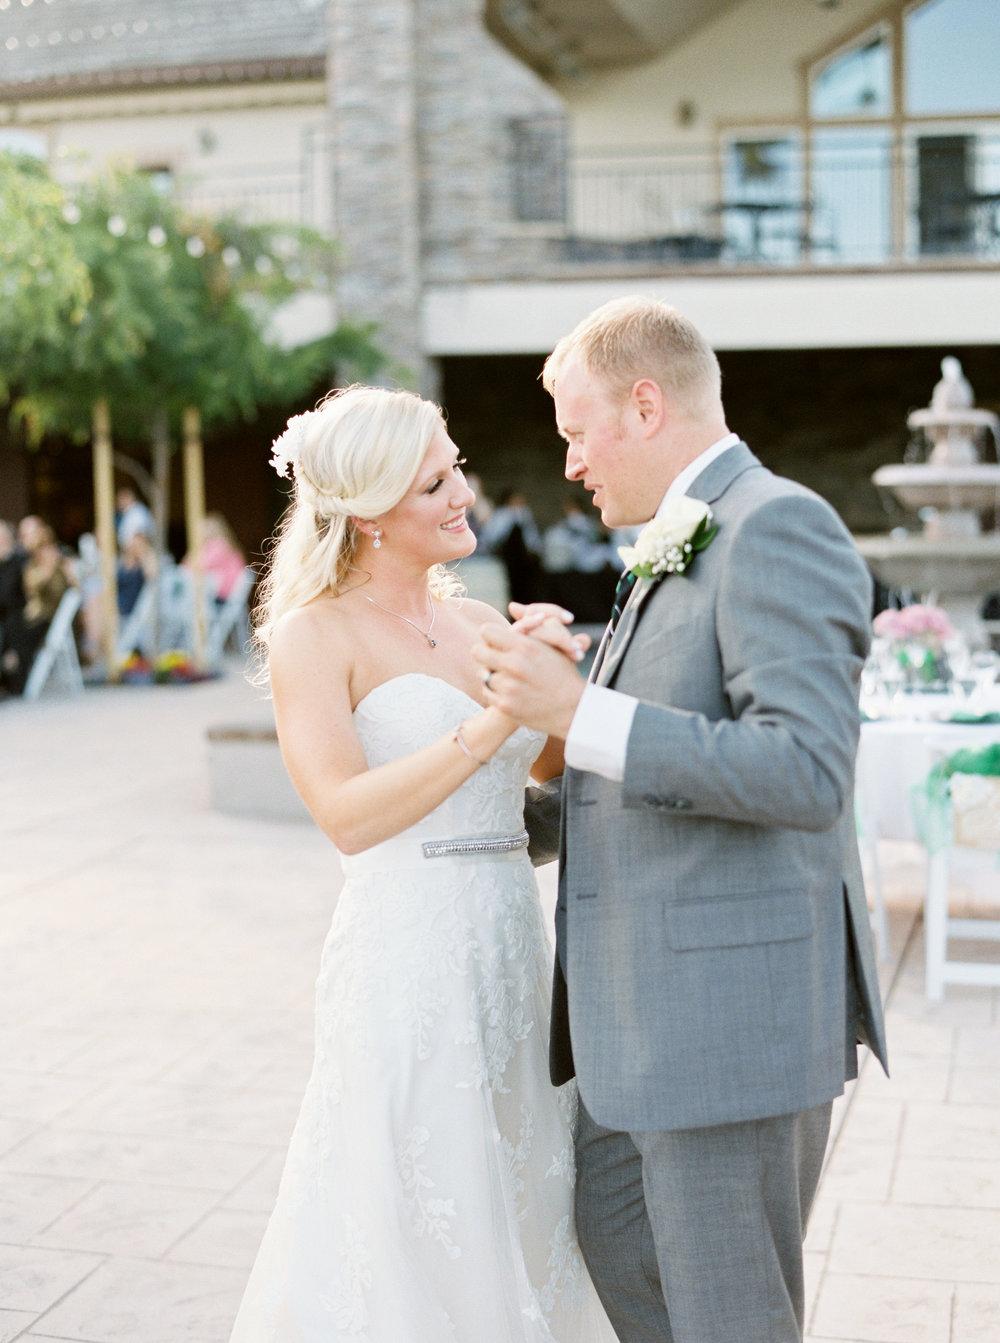 wolfe-heights-event-center-wedding-sacramento-california-wedding-72.jpg